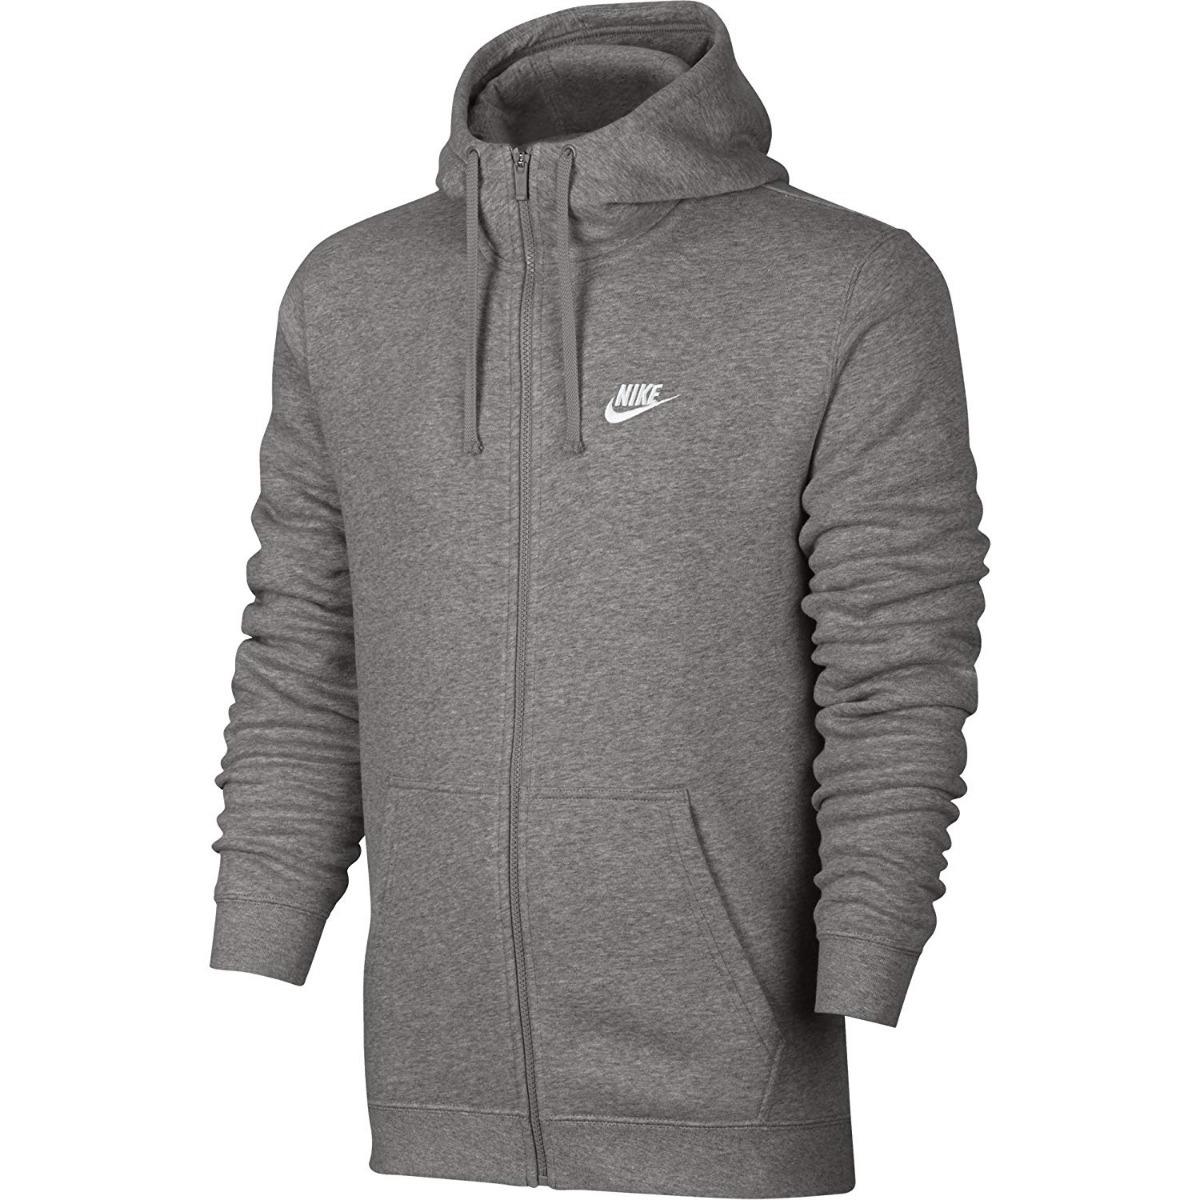 00 Nike 990 Para Dark En Hombre Grey Sudadera Heatherwhite z0qzYU